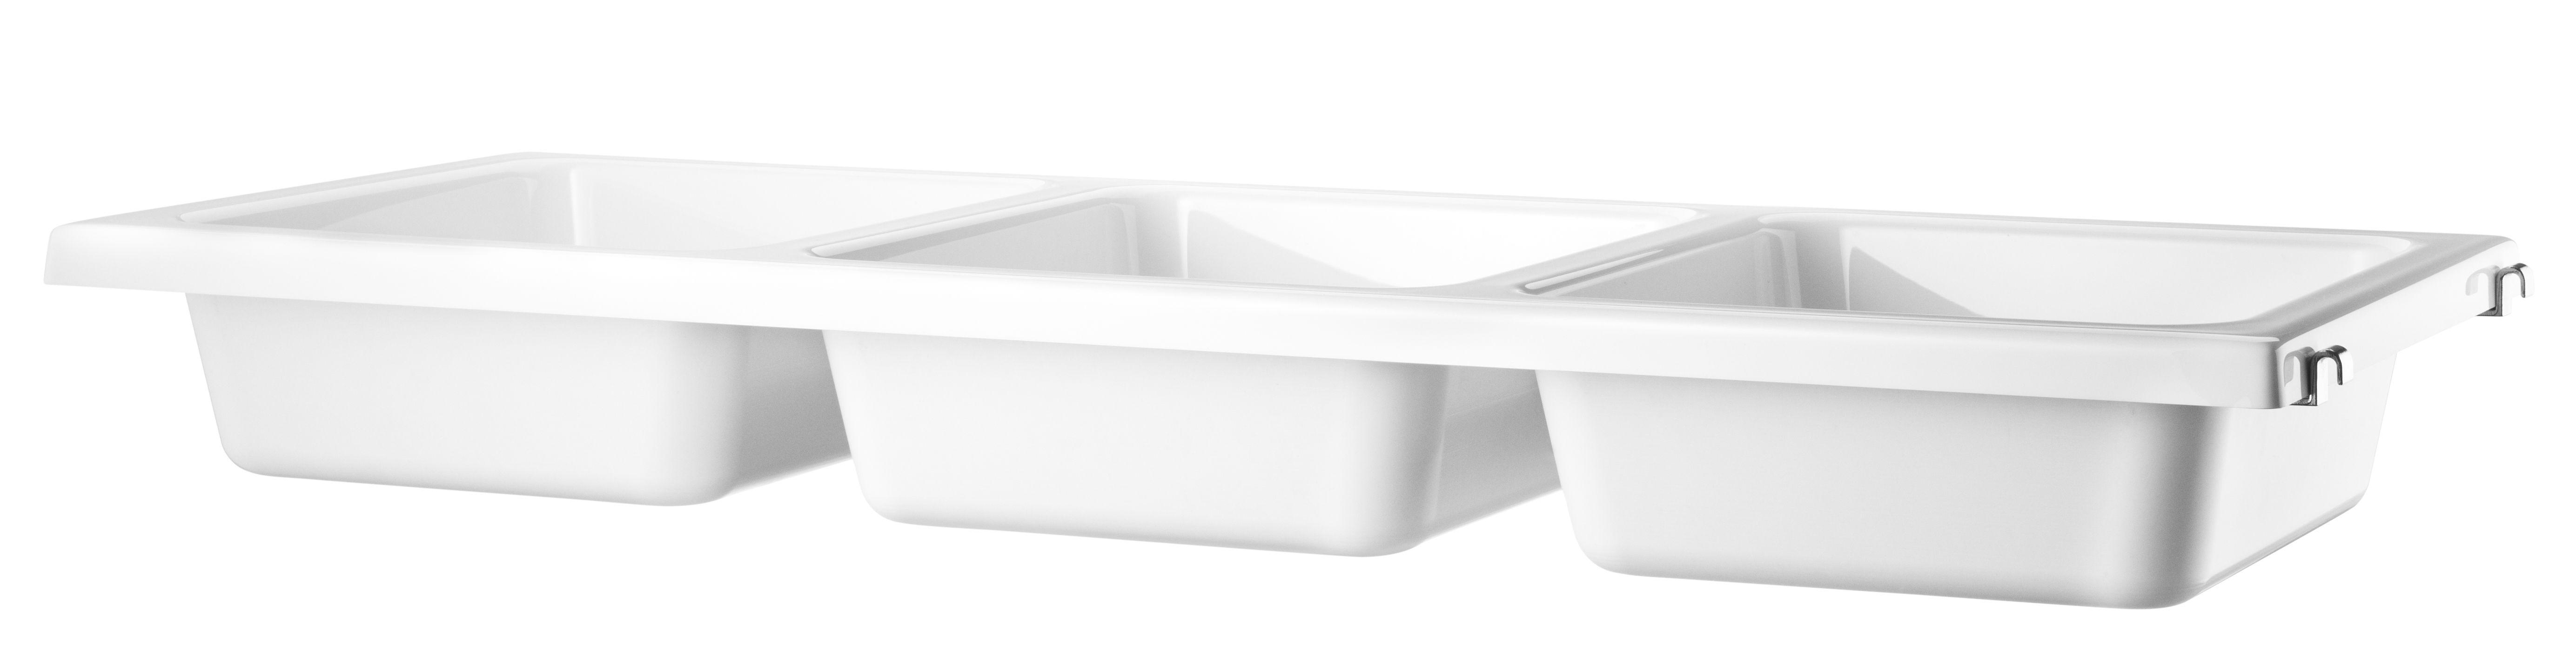 Furniture - Bookcases & Bookshelves - String System Shelf - / 3 bowls - L 78 cm by String Furniture - White - ABS